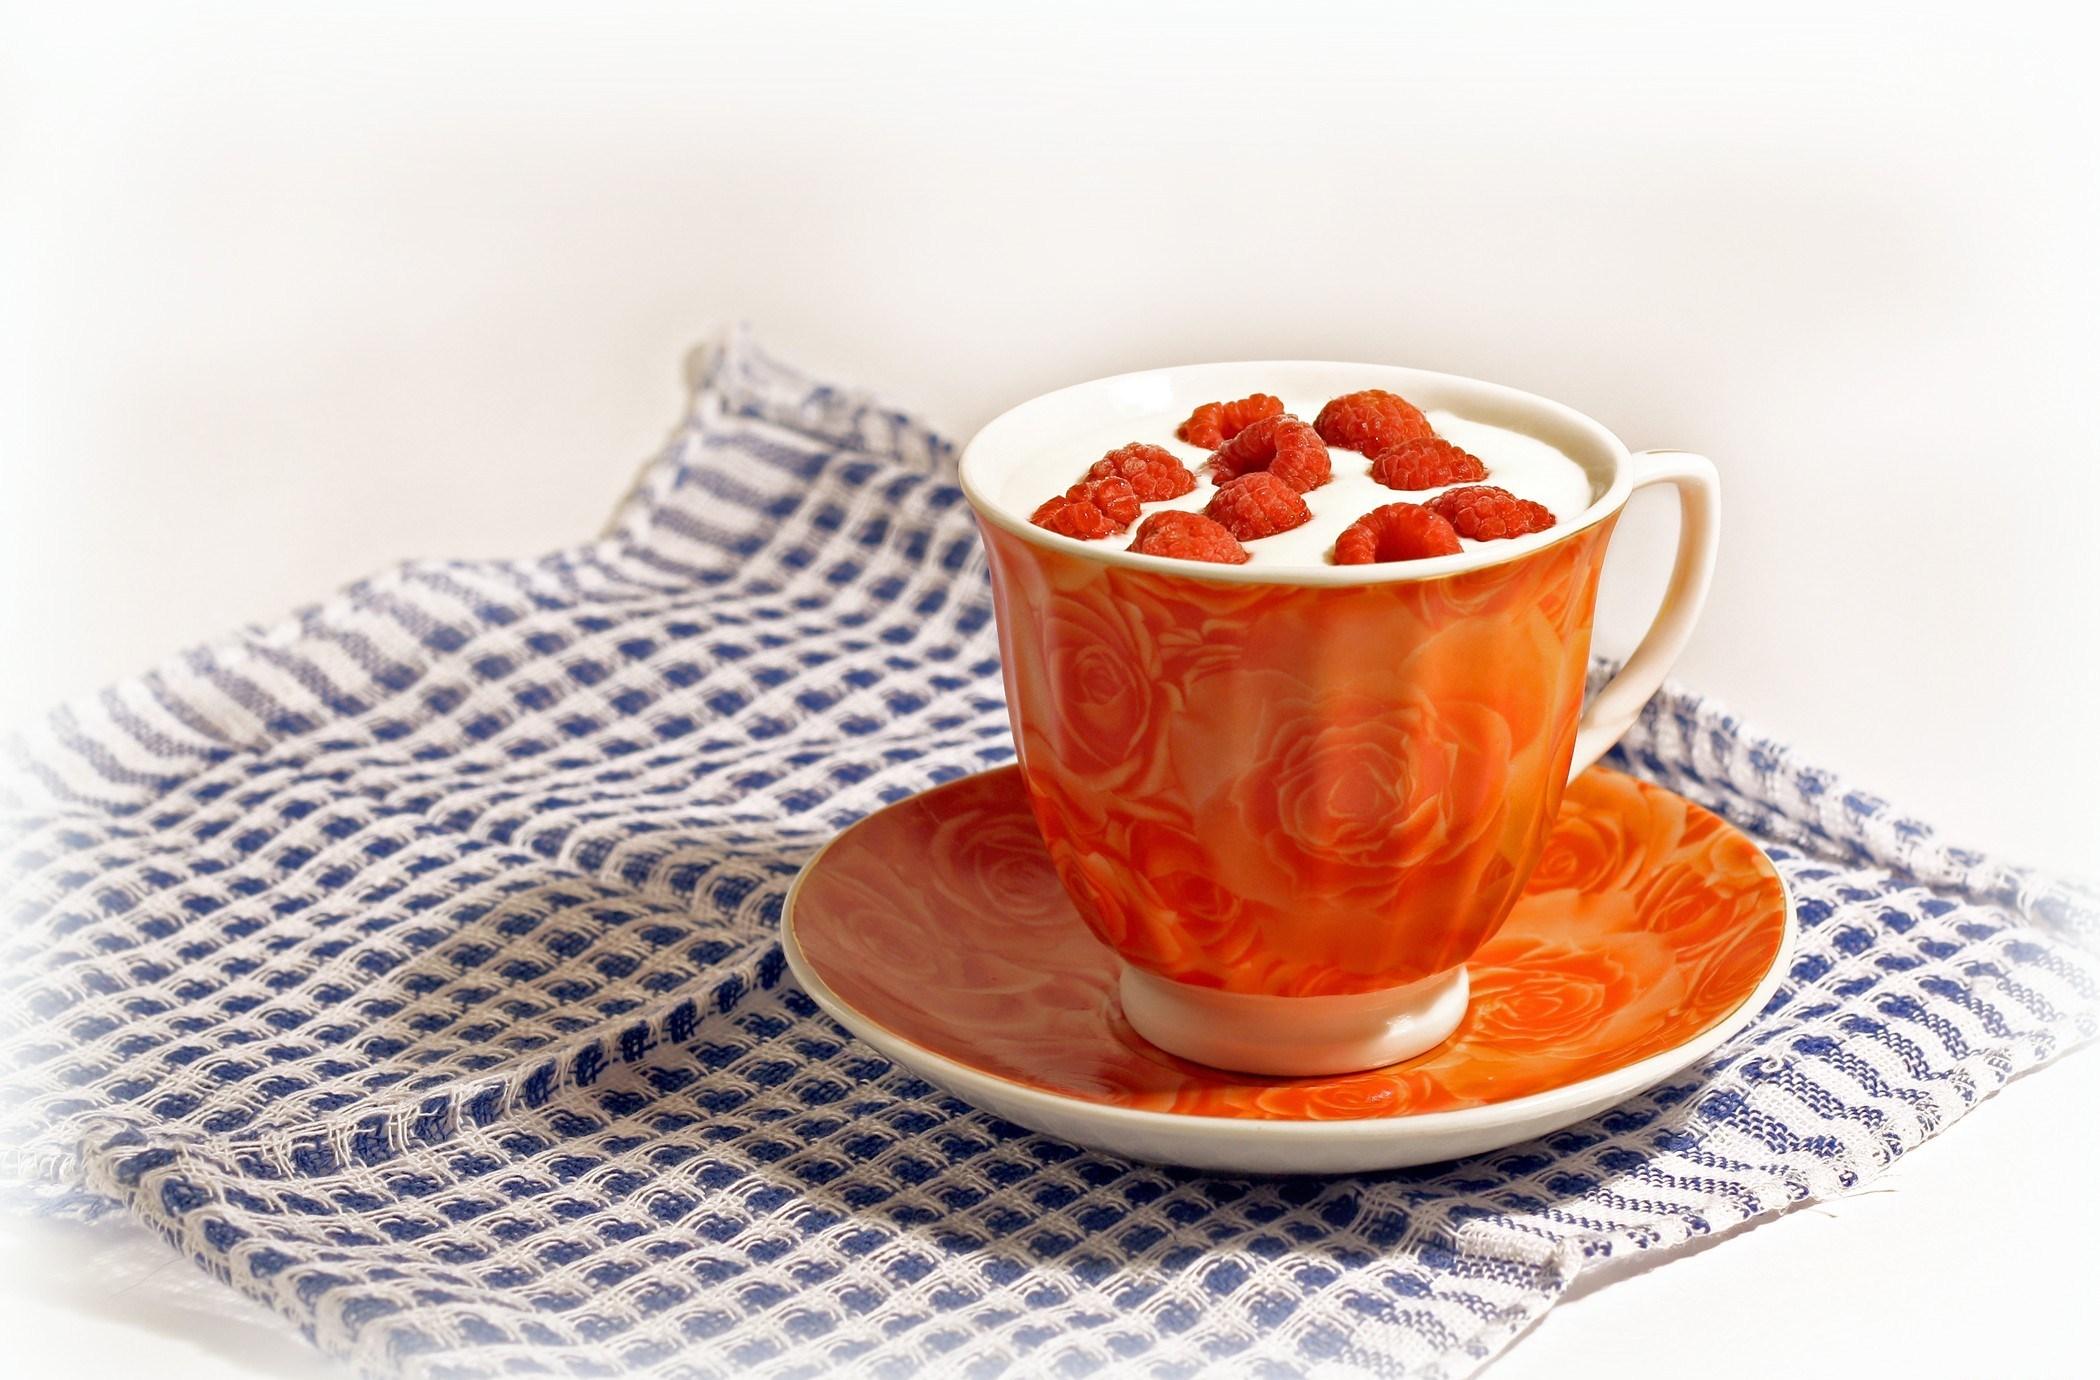 еда чай малина food tea raspberry  № 1100698 загрузить